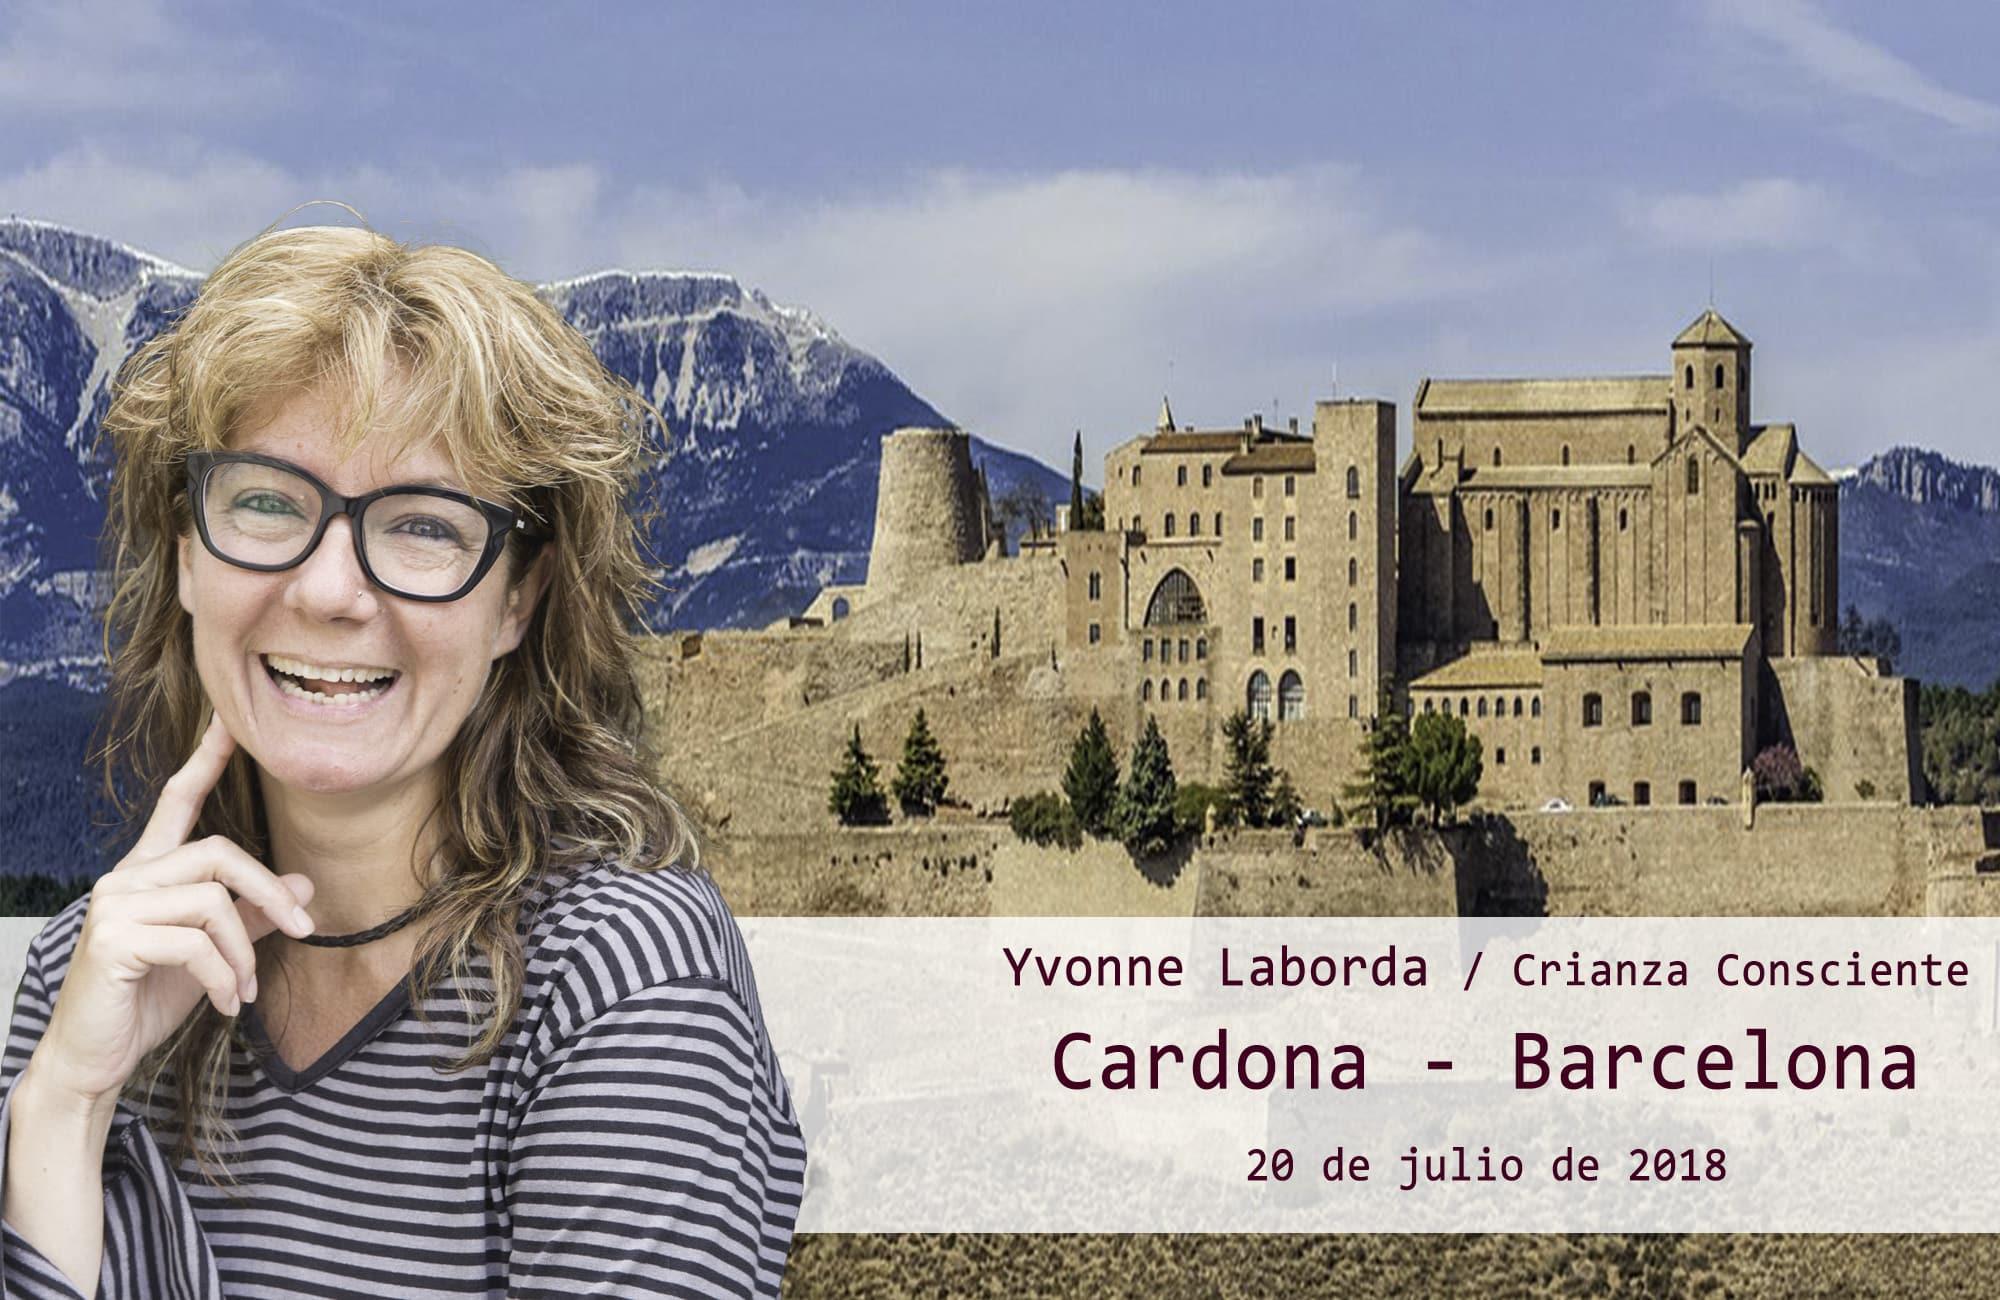 CARDONA, BARCELONA - CRIANZA CONSCIENTE @ Placeta de Sant Jaume | Cardona | Catalunya | España